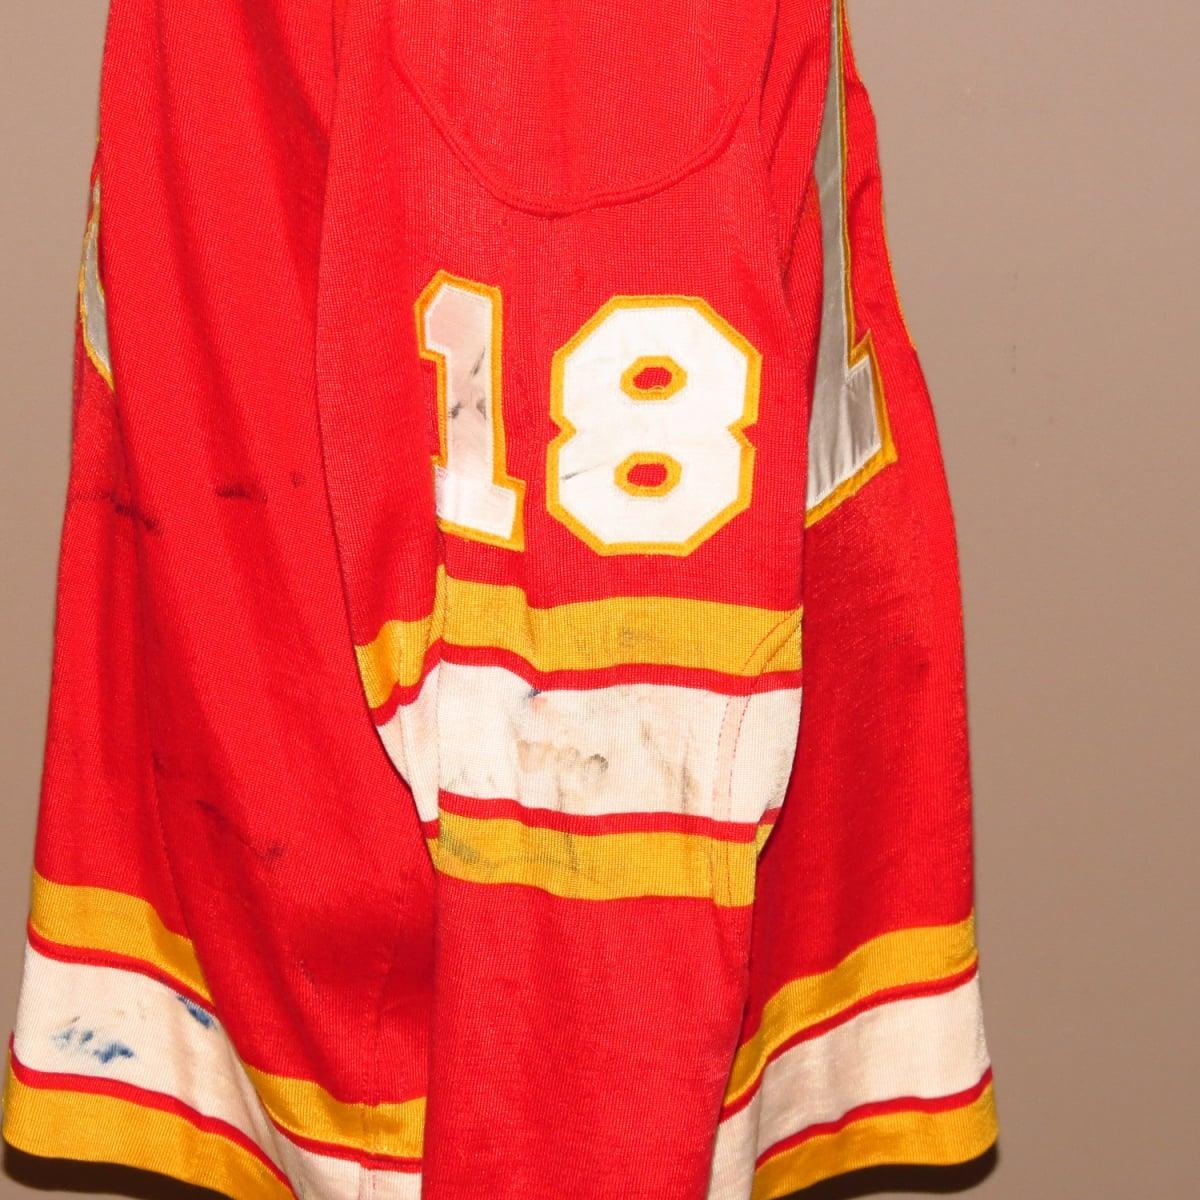 NHL-Stick-Marks-repairs-Flames-1974